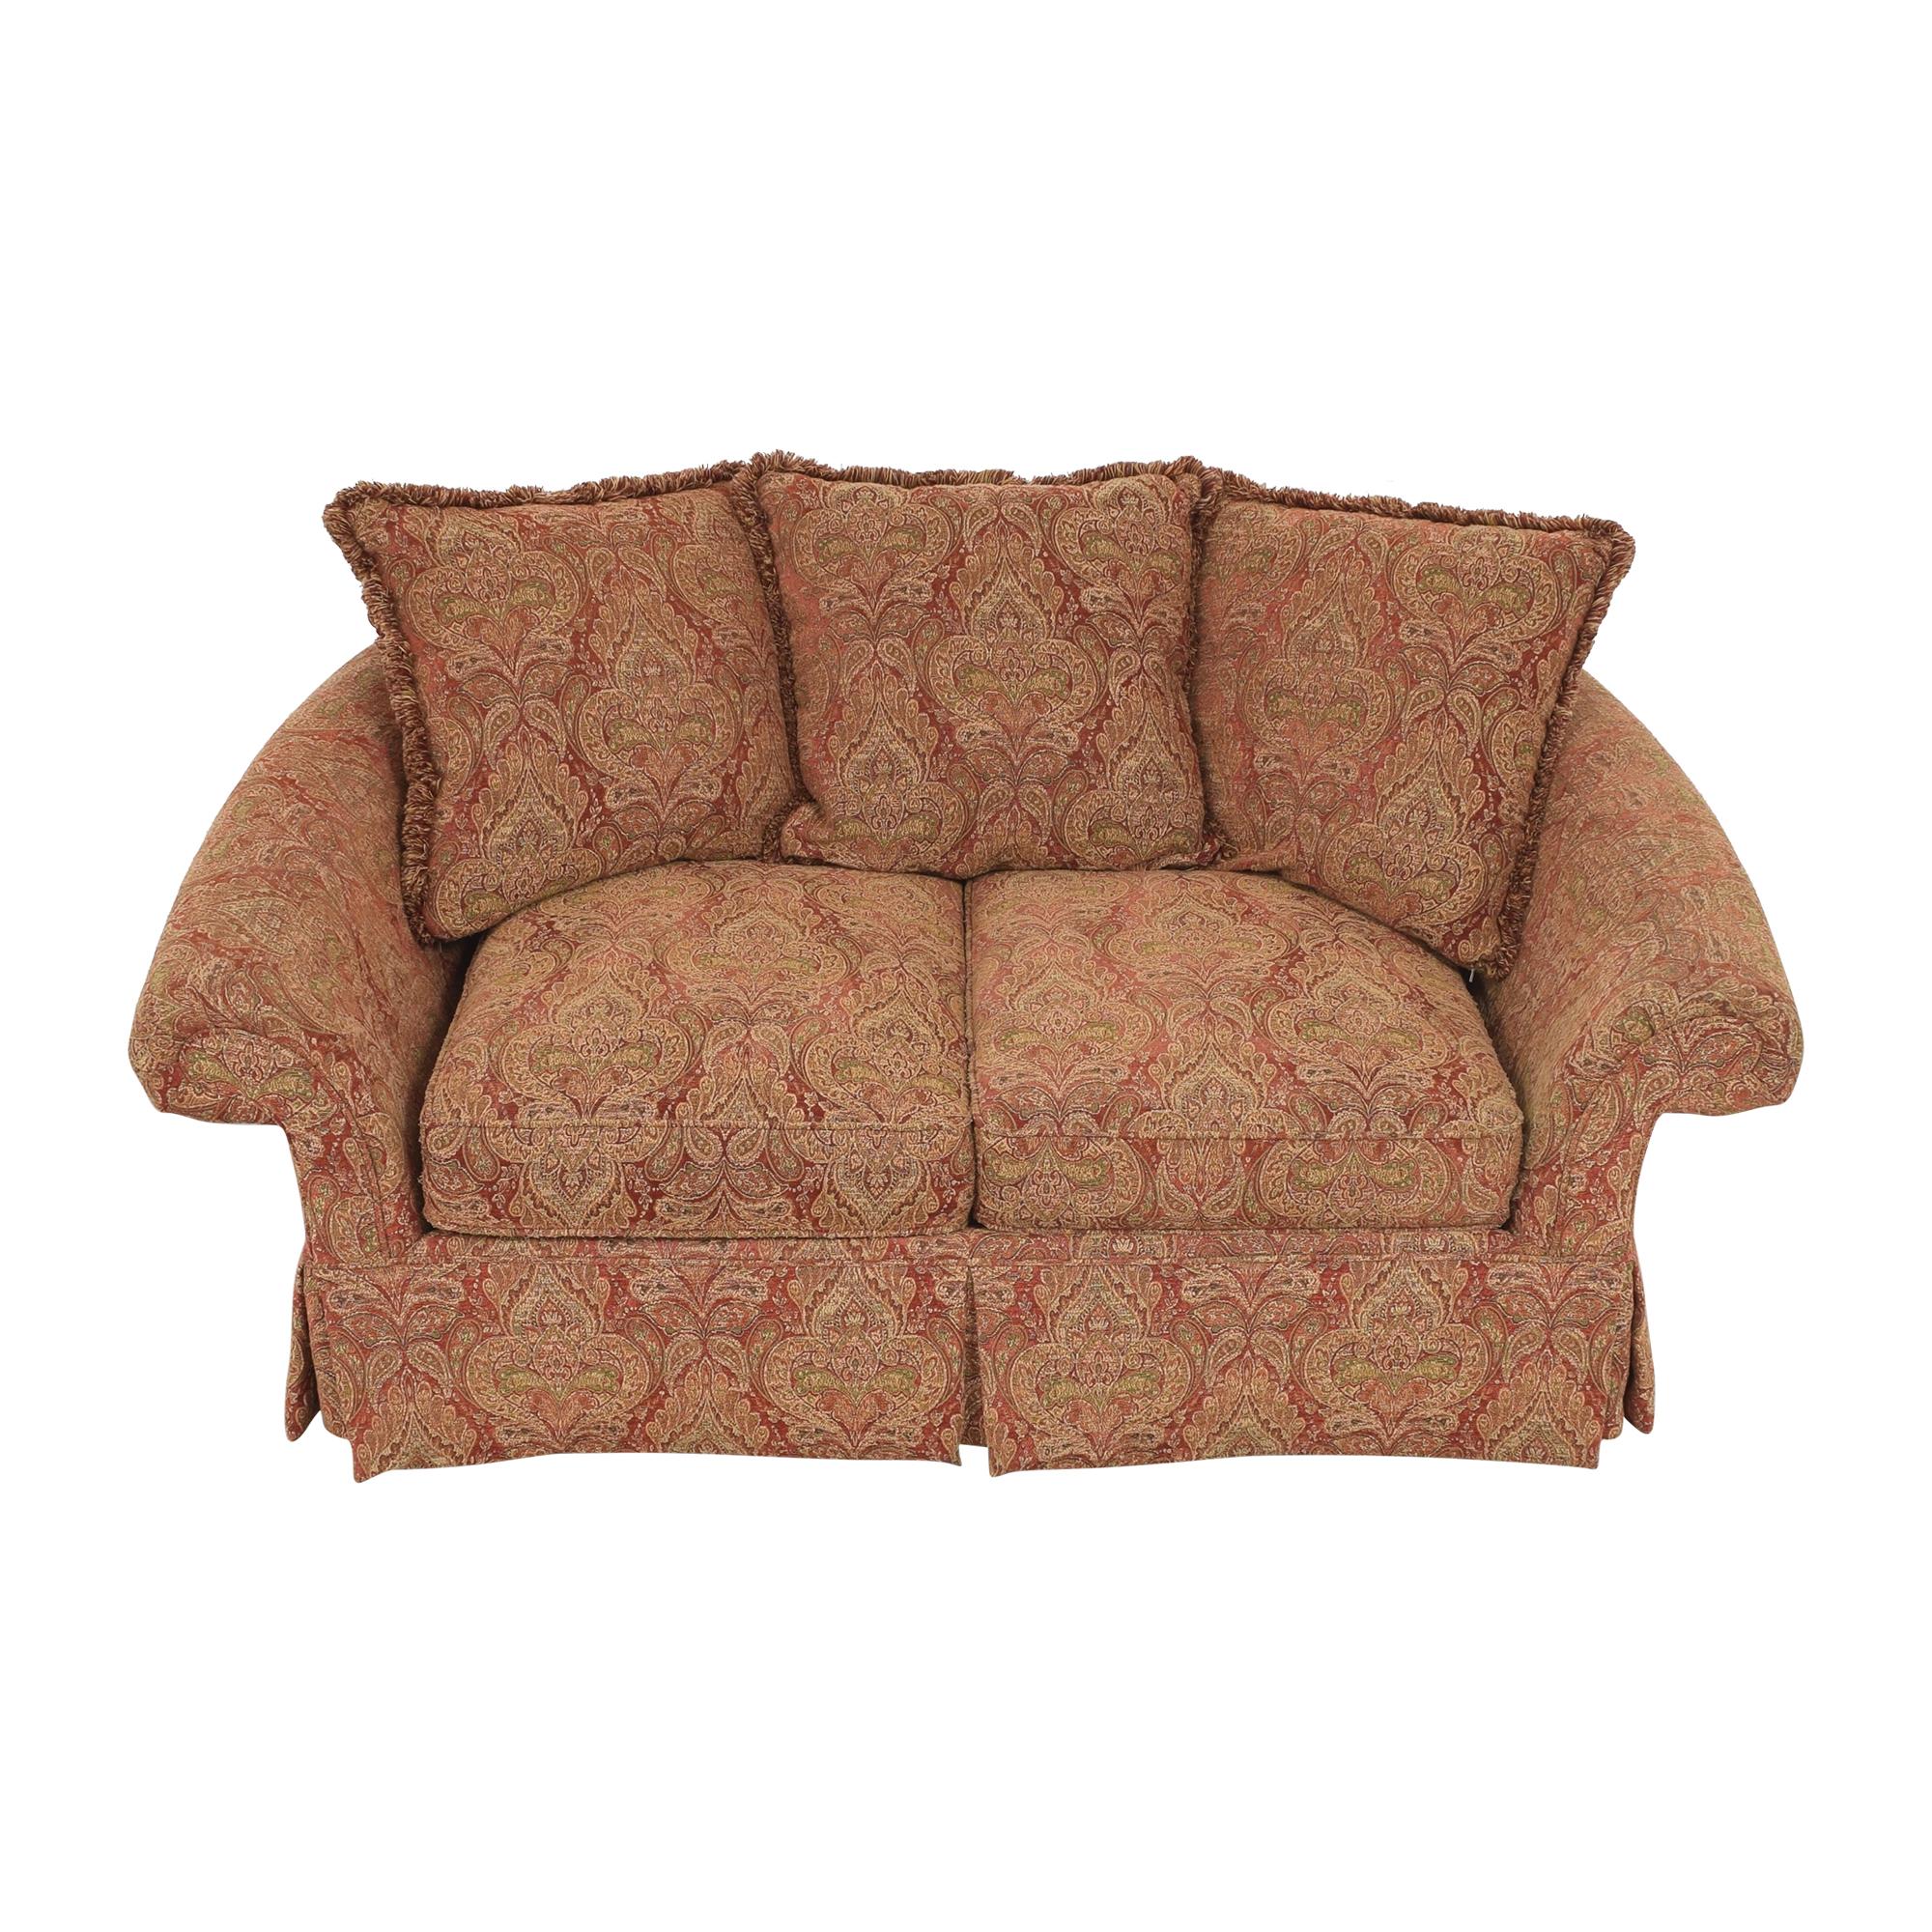 Raymour & Flanigan Raymour & Flanigan Two Cushion Skirted Sofa